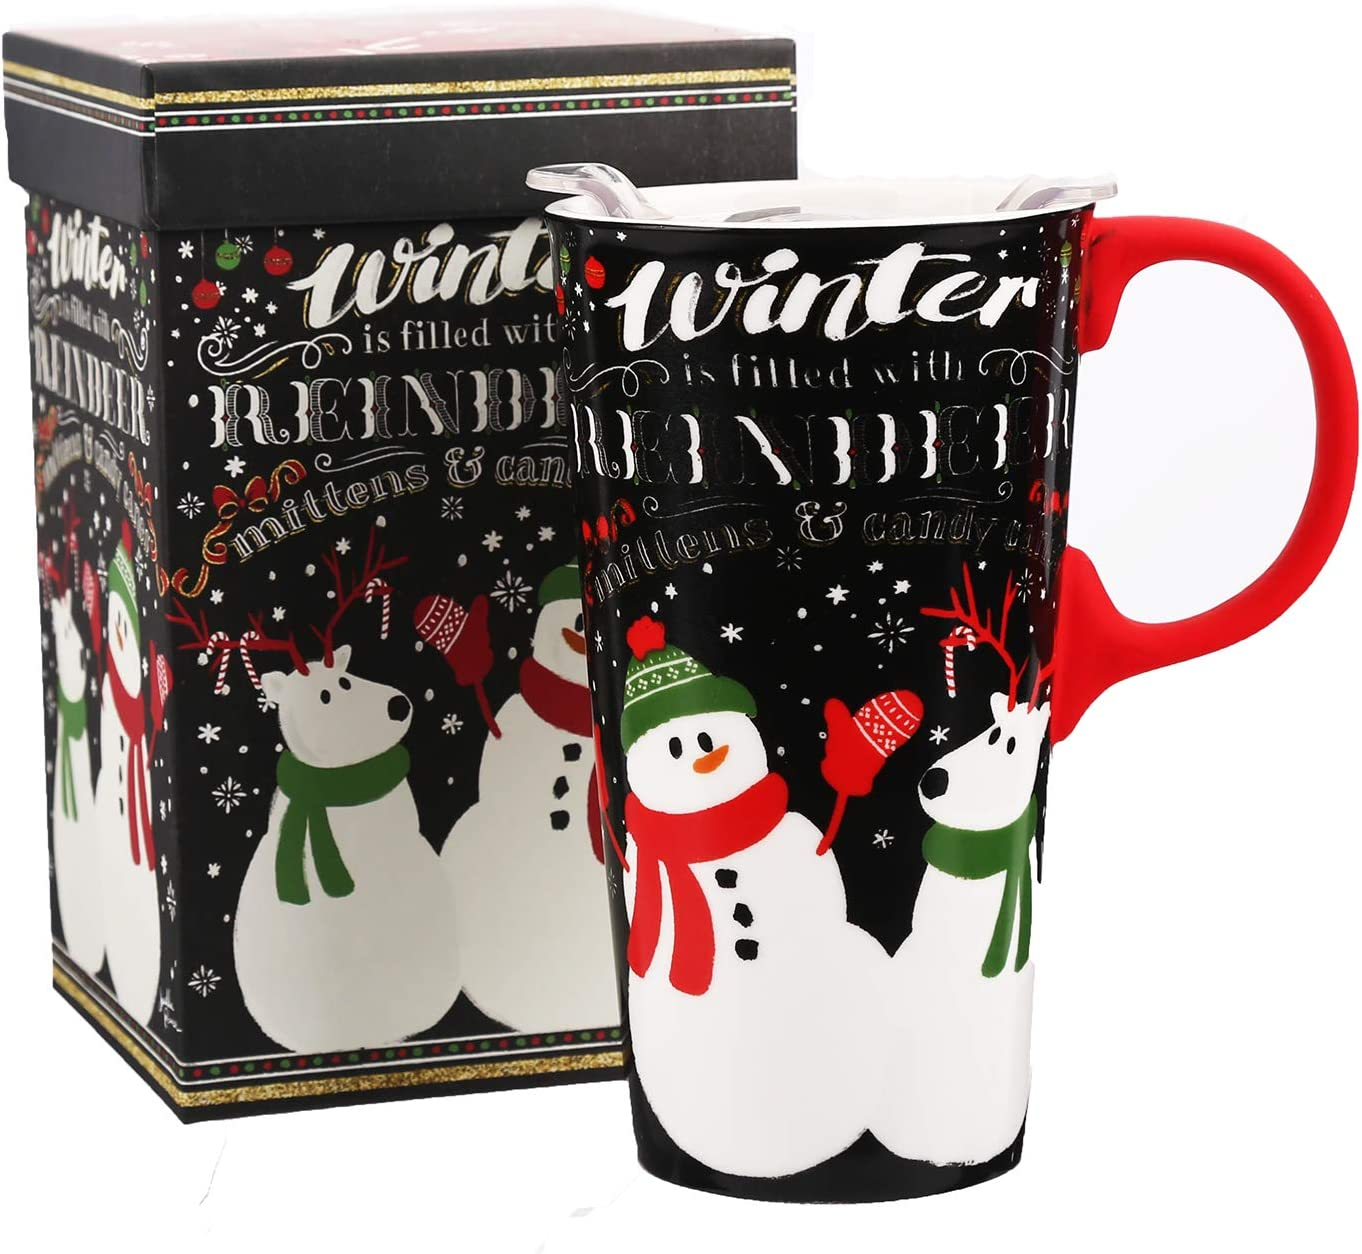 Ceramic Travel Mug for Coffee or Tea Sealed Lid 17 oz.with Gift Box,Snowman